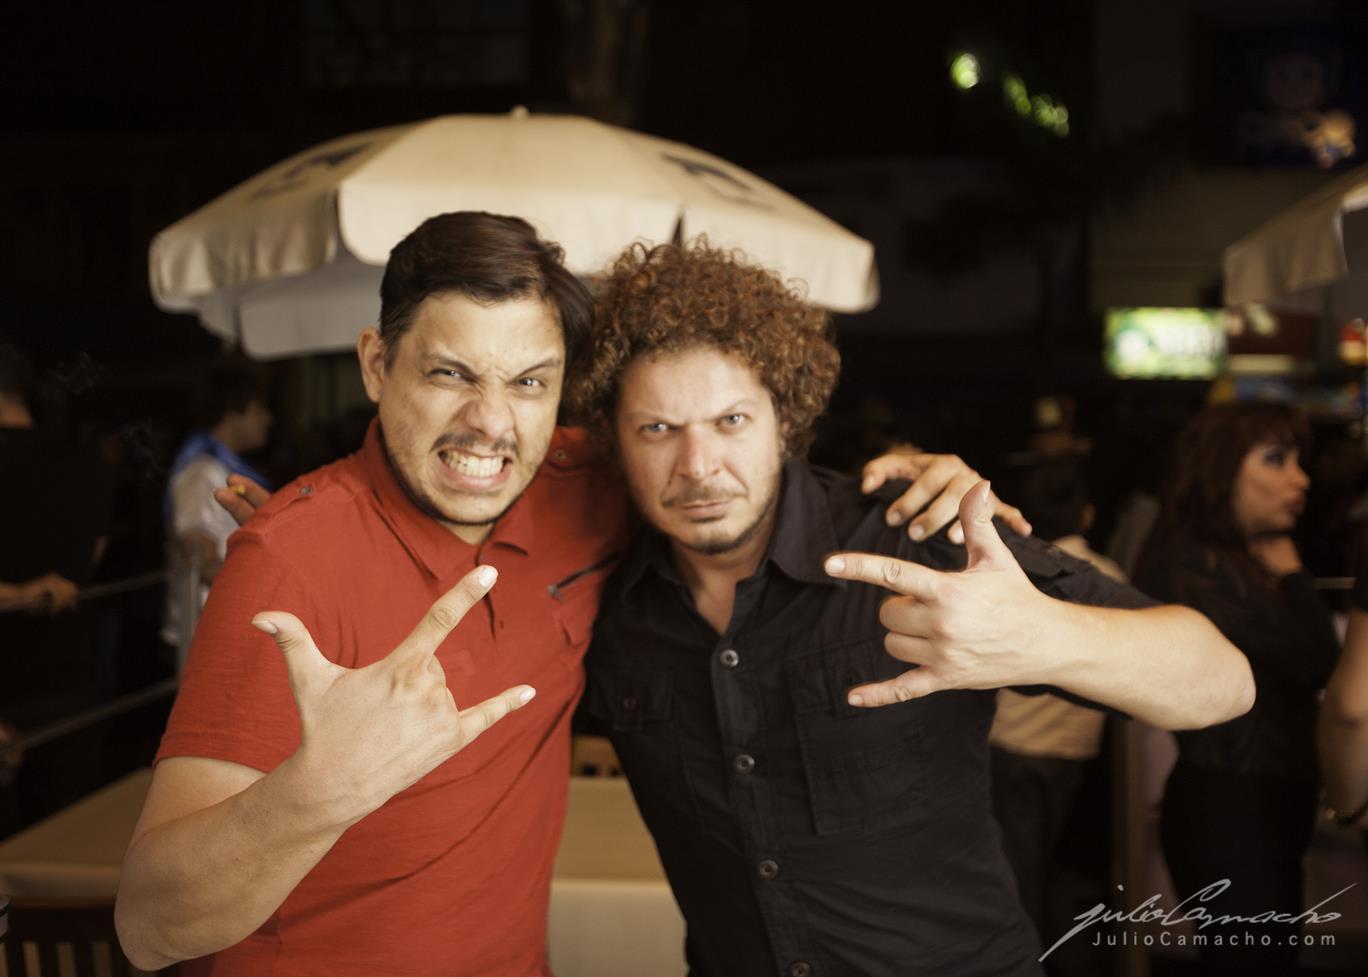 2014-10-30 31 CAST TOUR Ensenada y Tijuana - 1882 - www.Juli (Copy).jpg